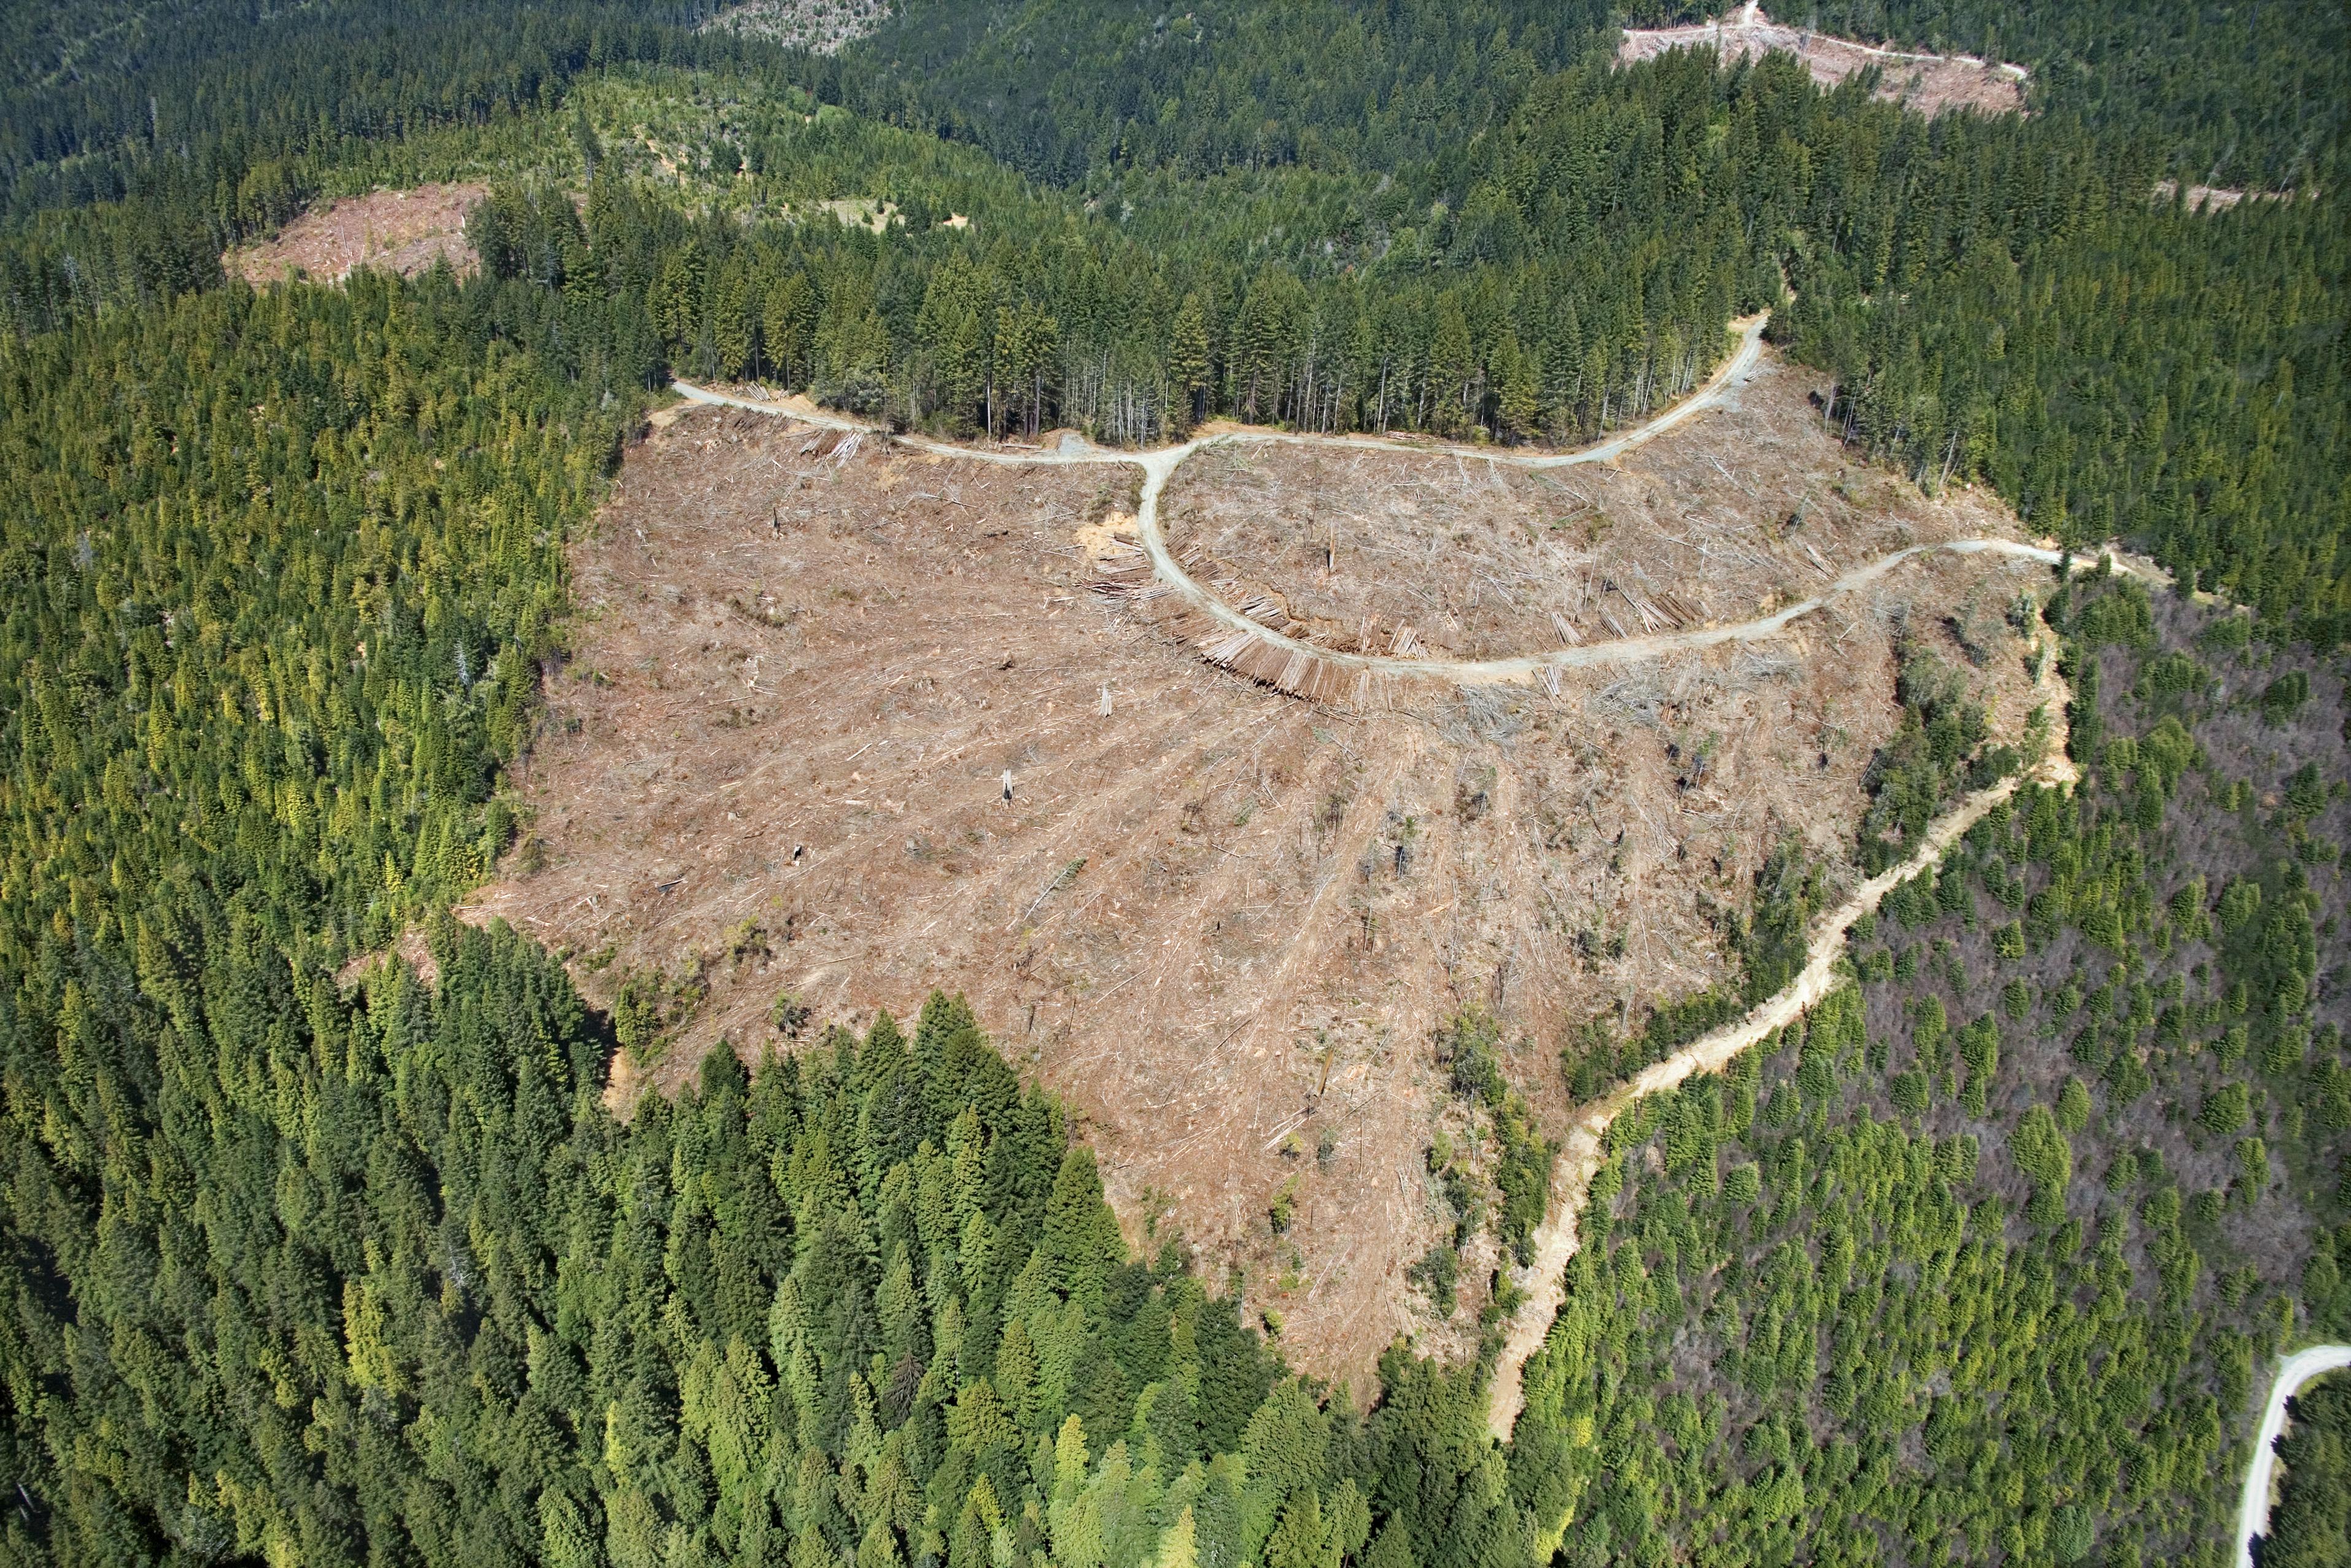 Soil erosion due to rainforest deforestation sciencing for Soil erosion causes